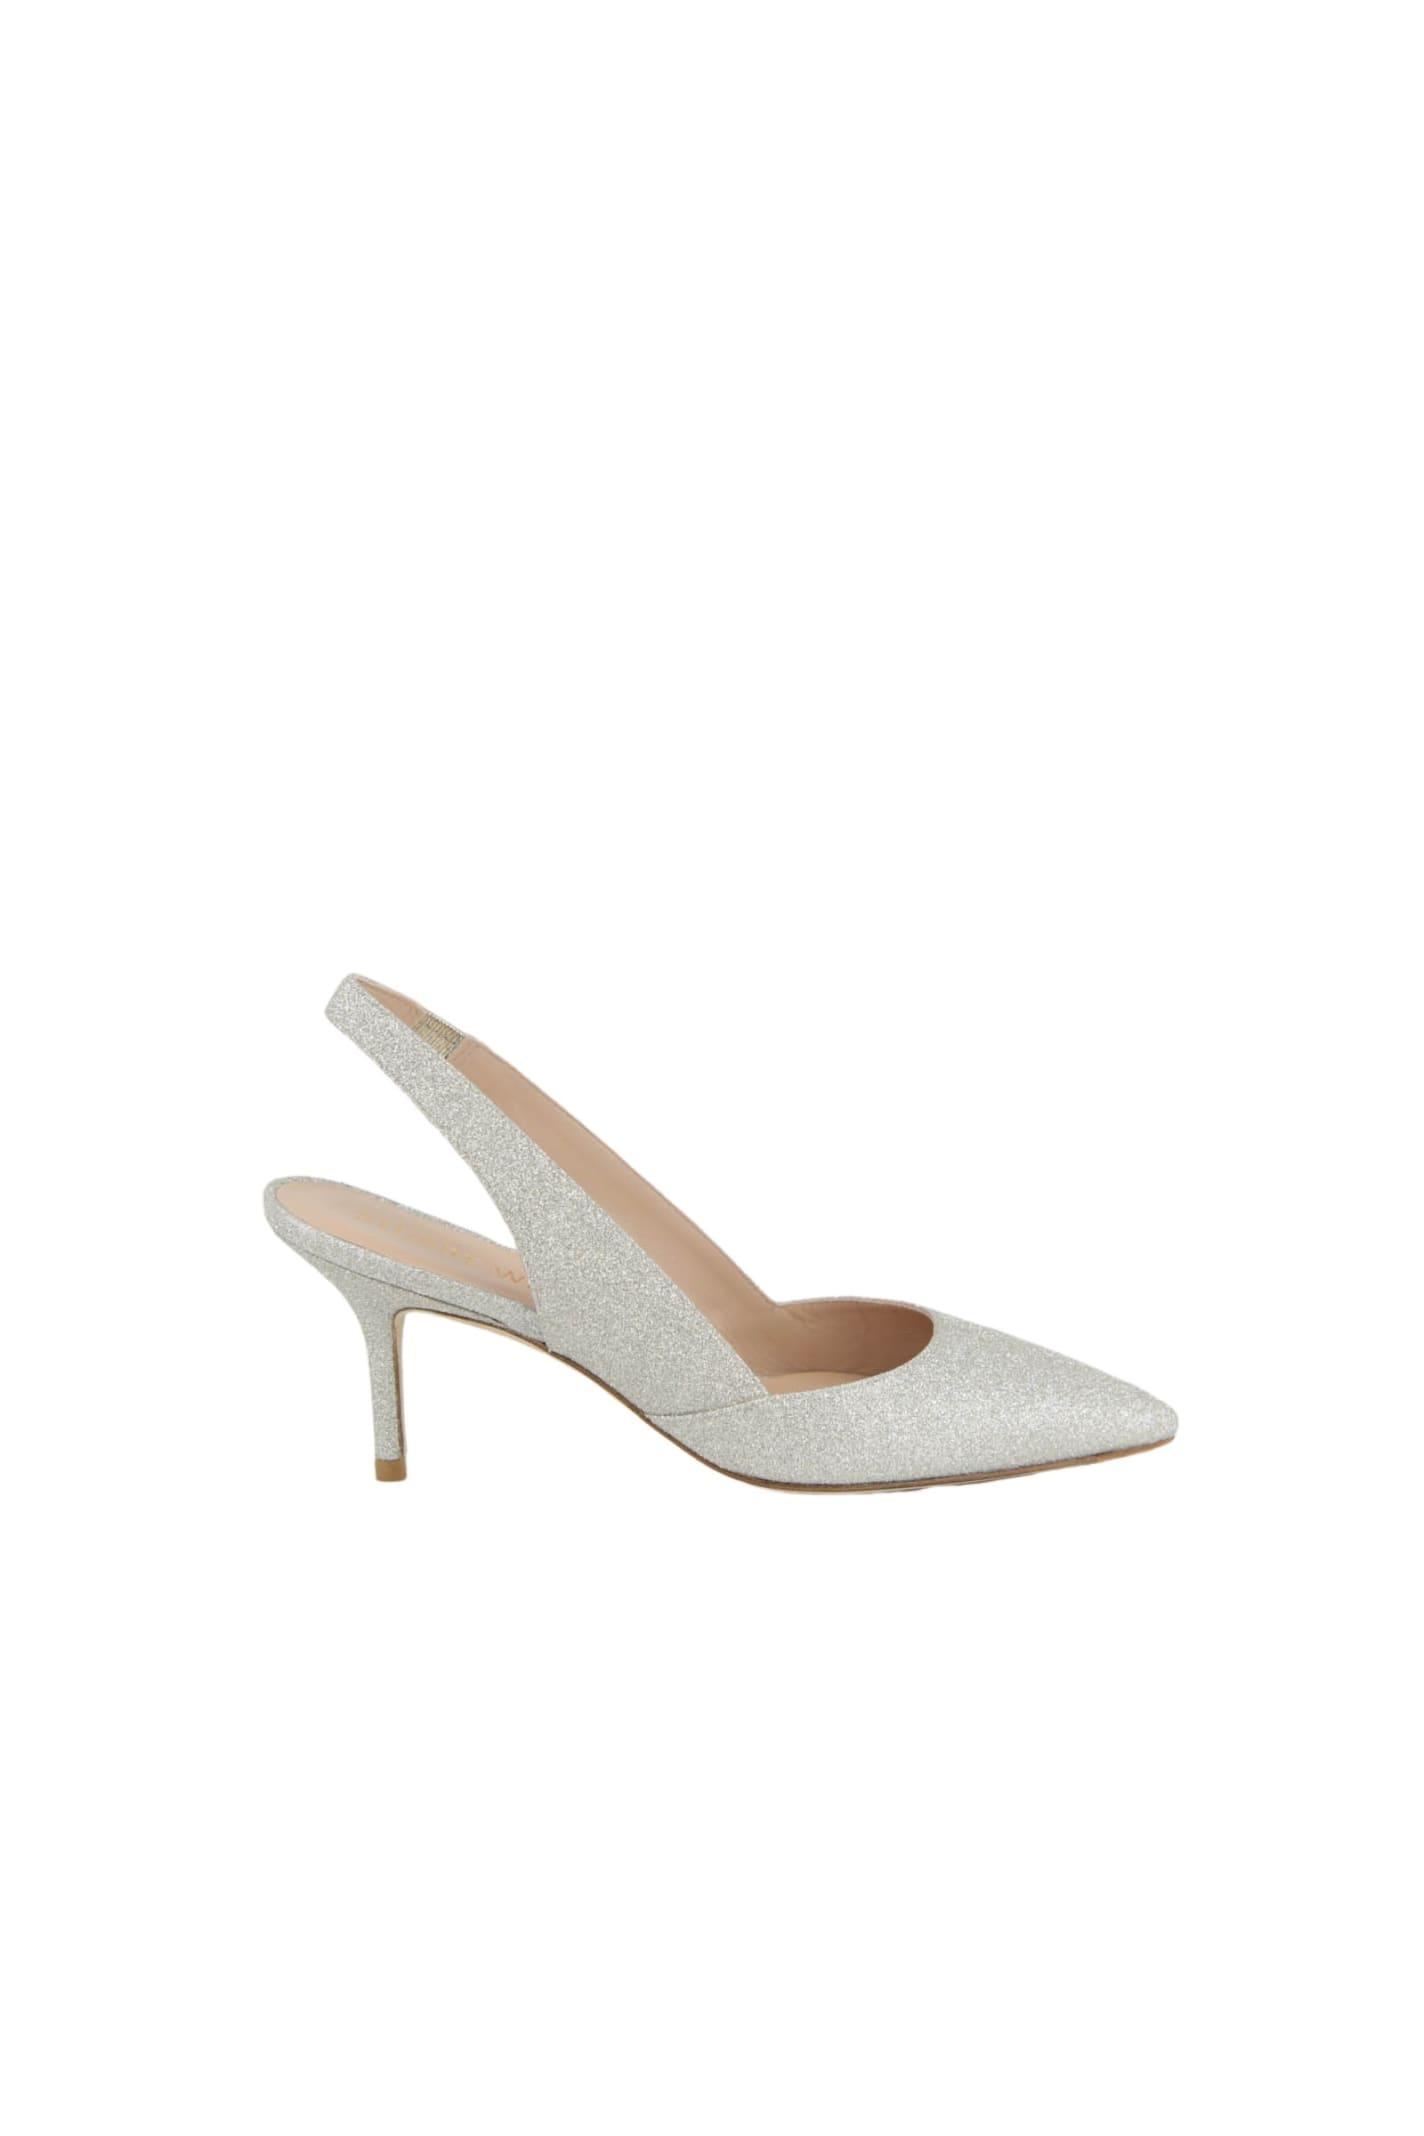 Buy Stuart Weitzman Shoes online, shop Stuart Weitzman shoes with free shipping